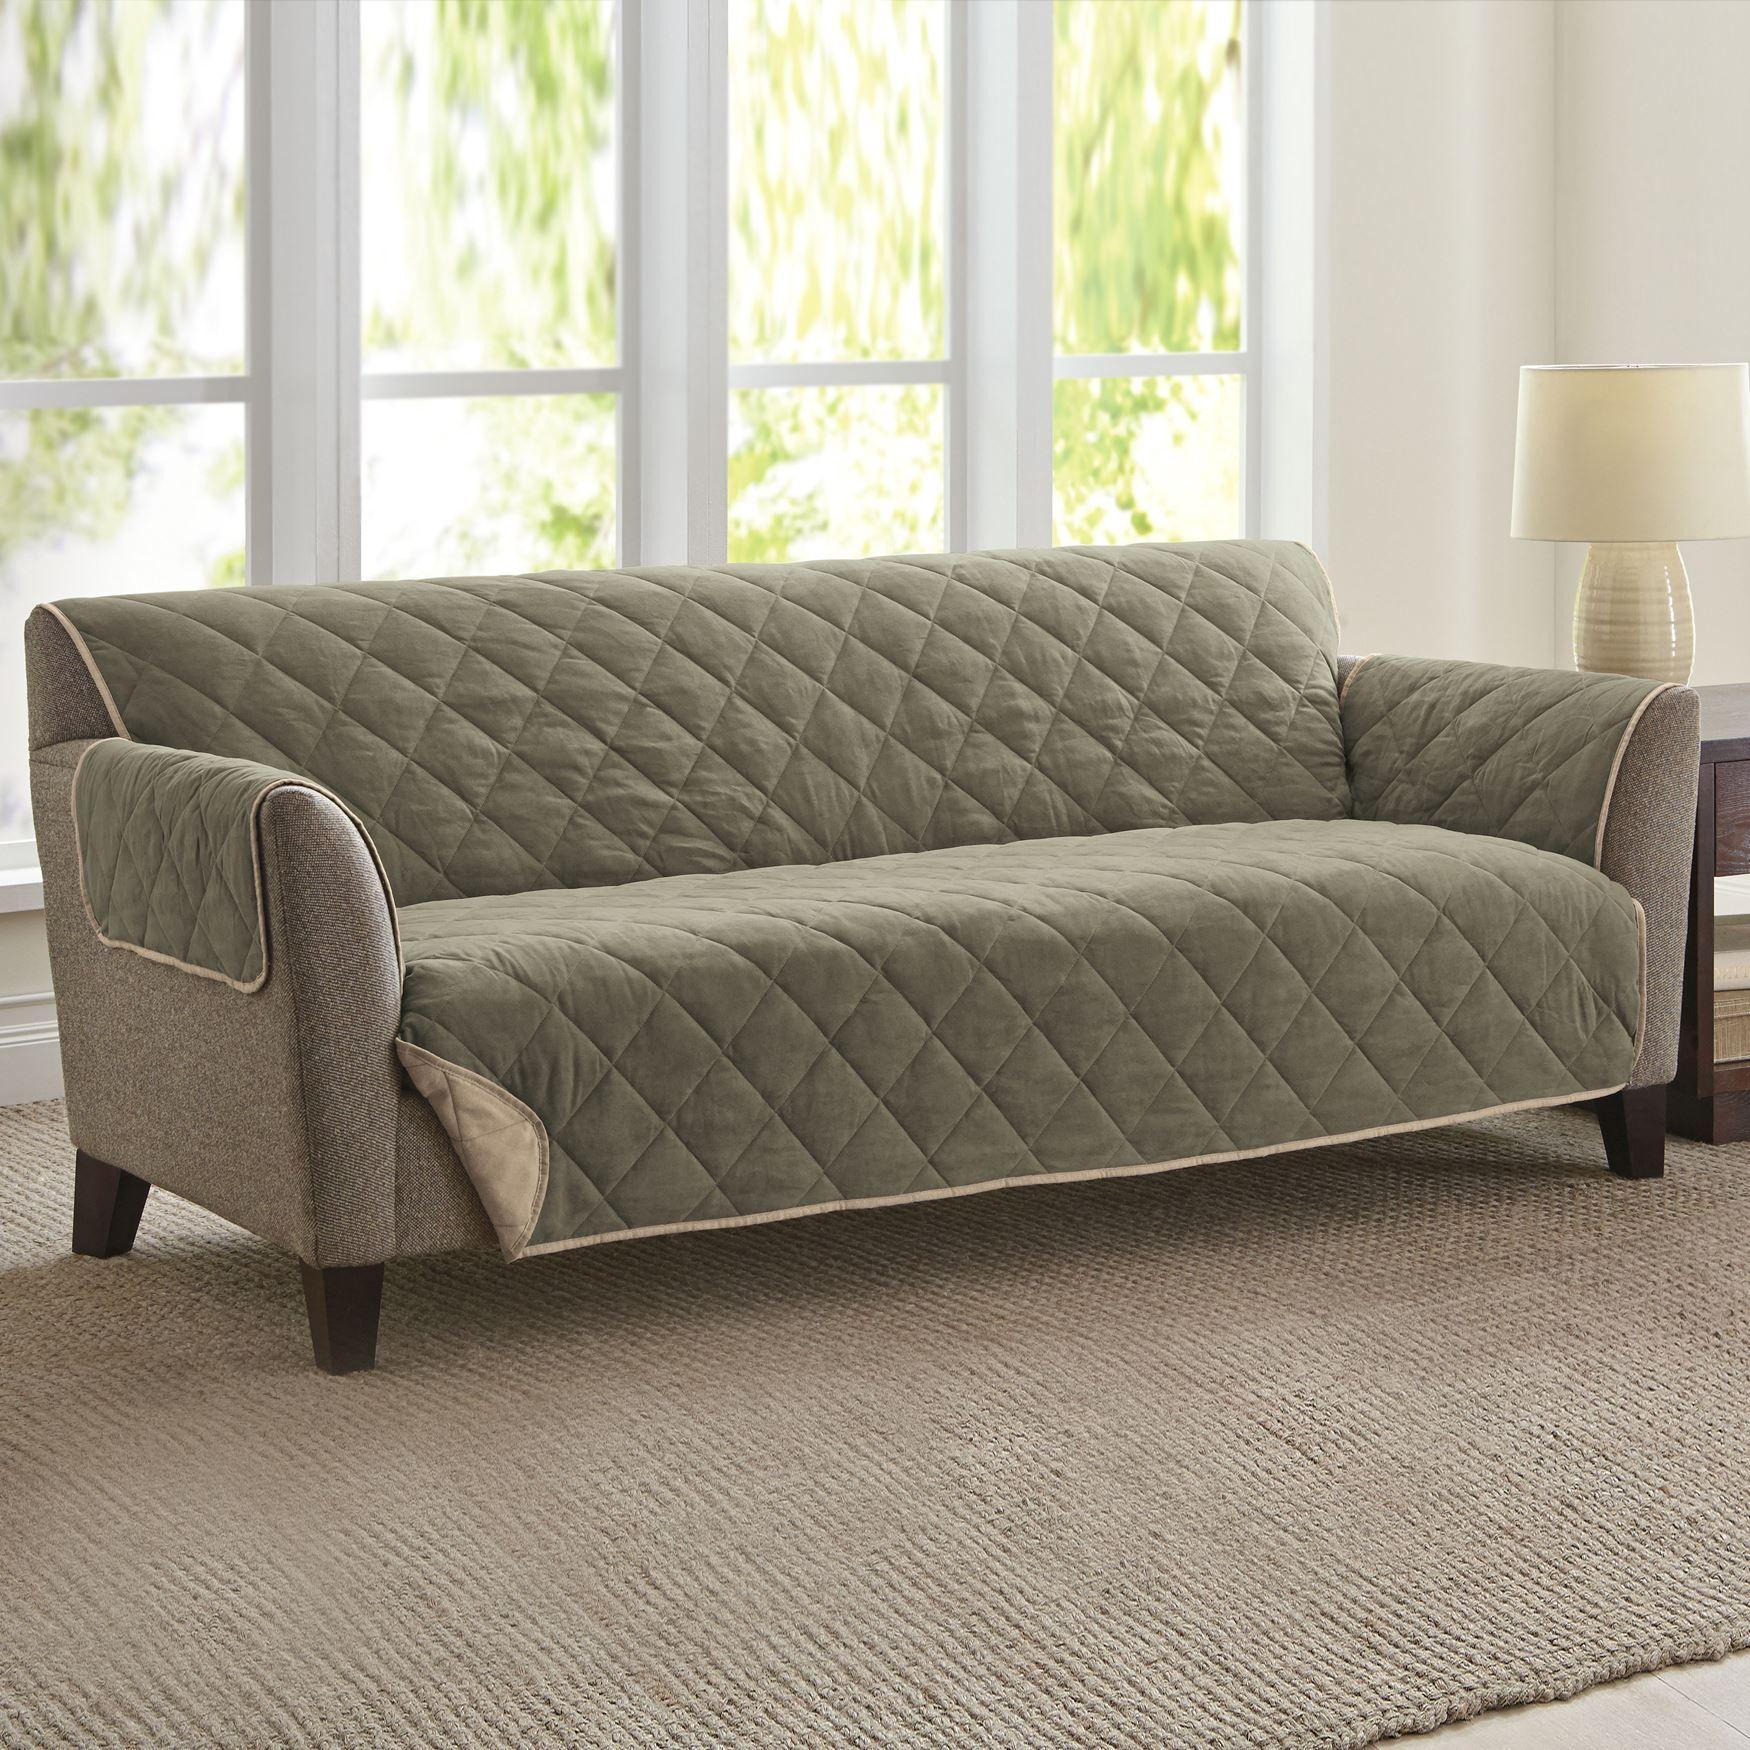 10 Genius Designs Of How To Craft Extra Large Sofa Covers Best Sofa Covers Long Sofa Sofa Covers